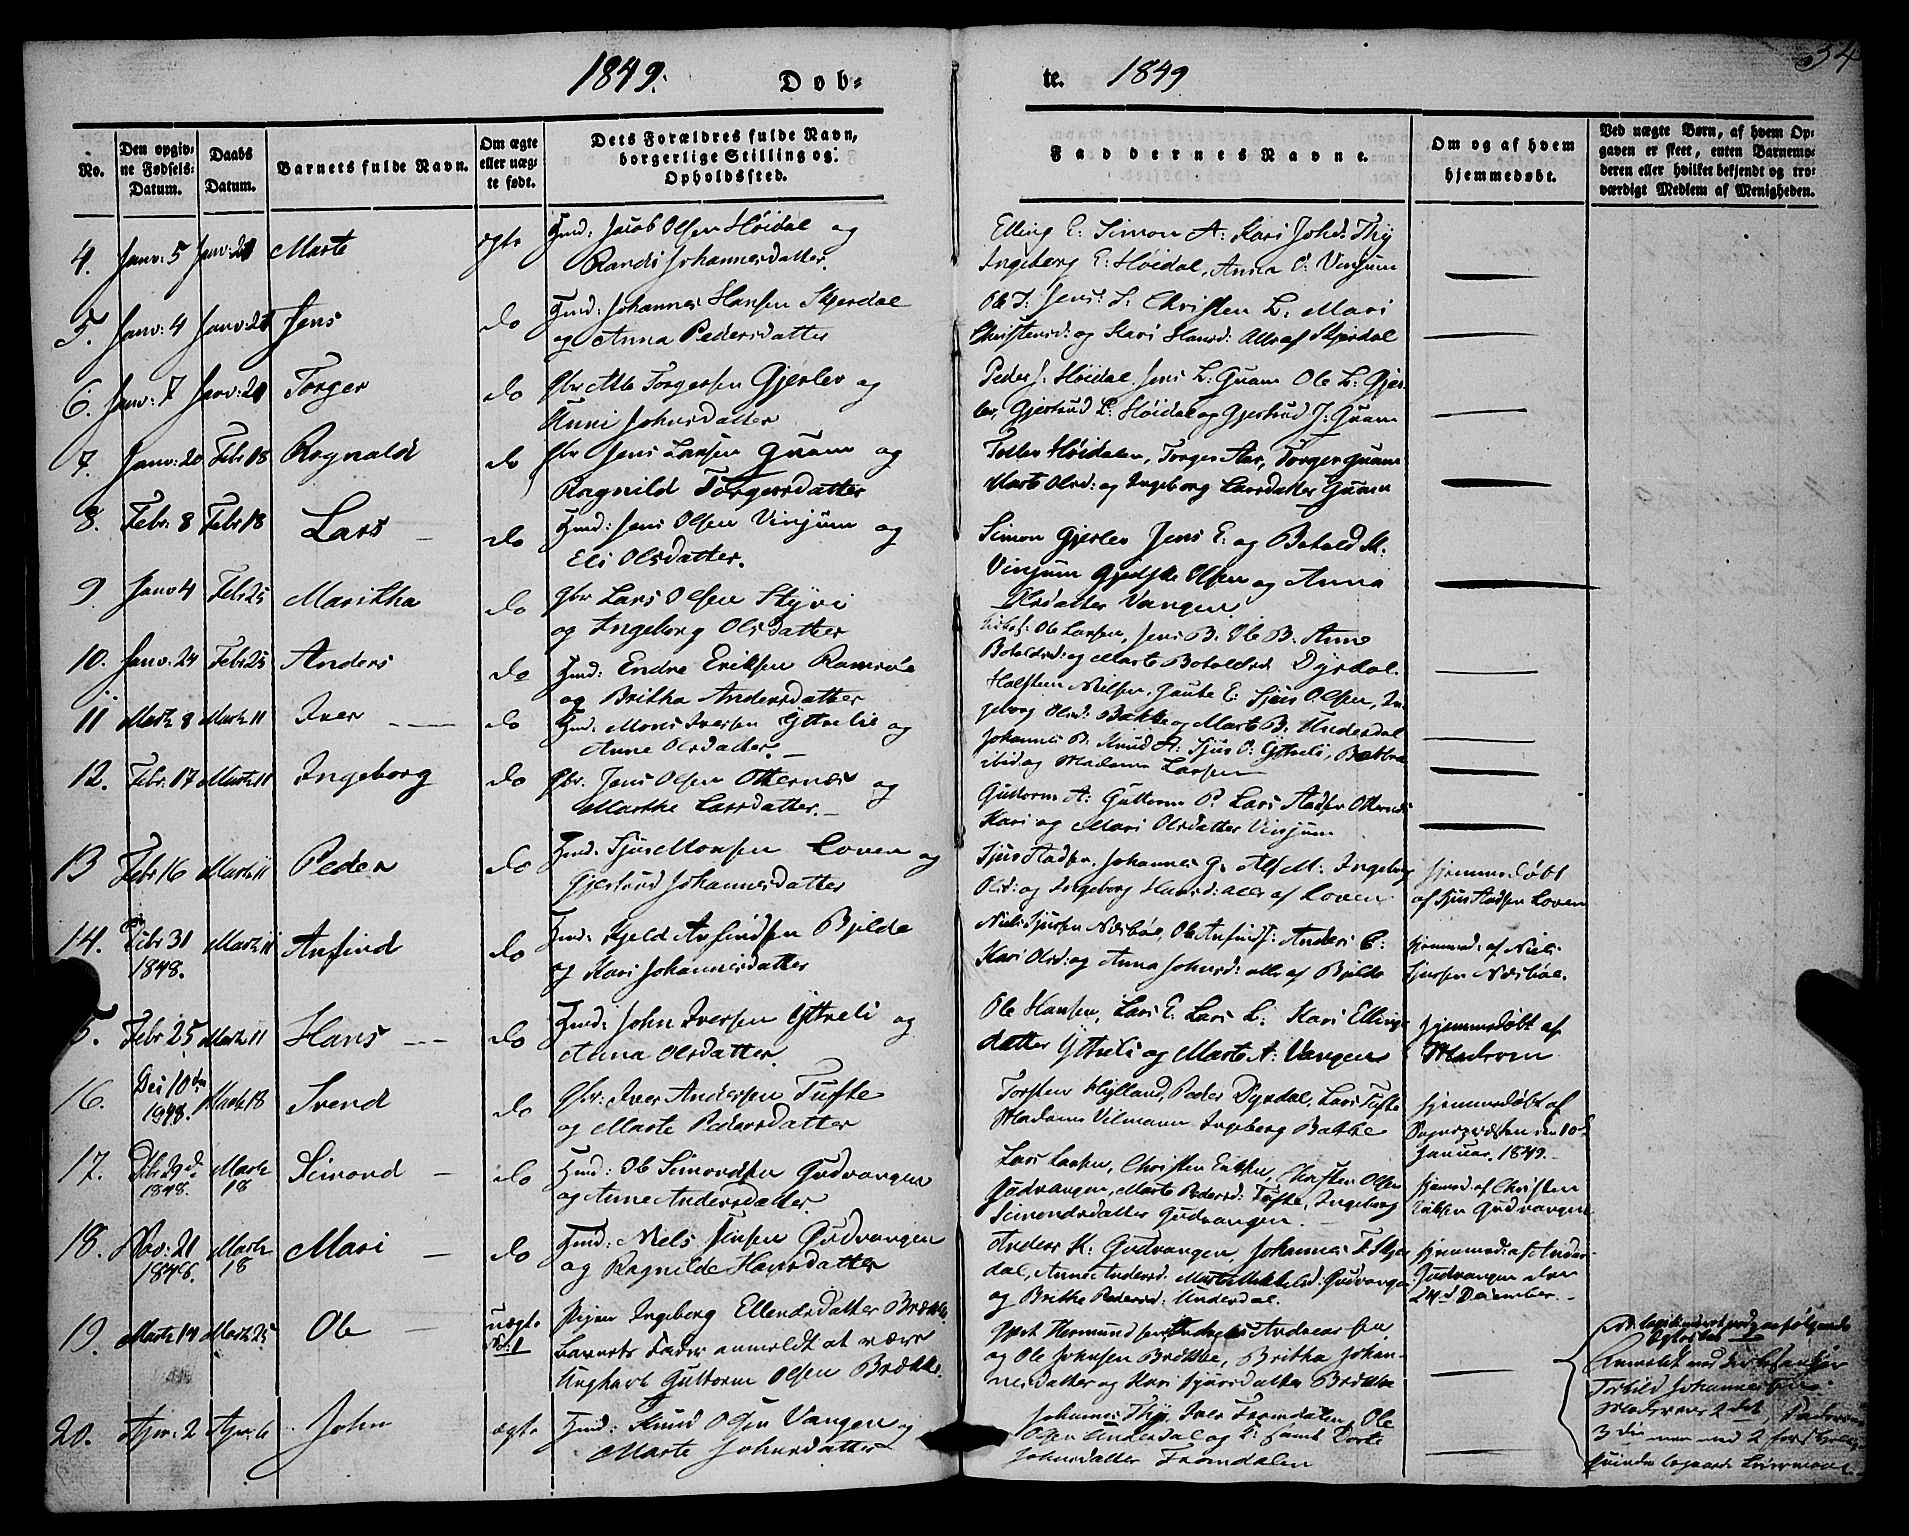 SAB, Aurland sokneprestembete, H/Ha/Haa/L0007: Ministerialbok nr. A 7, 1842-1853, s. 54